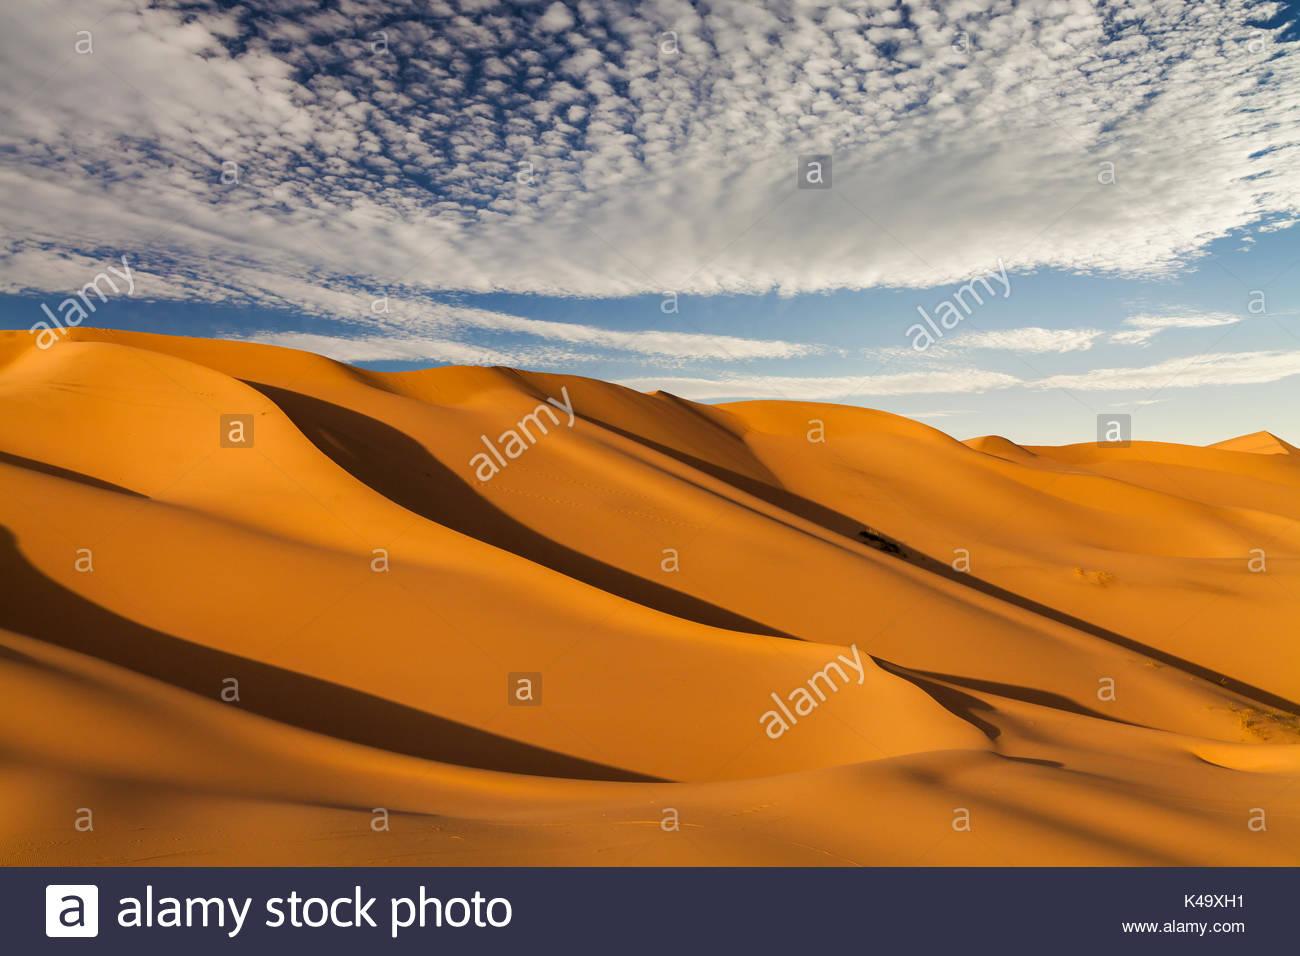 Beautiful sand dunes in the Sahara desert - Stock Image